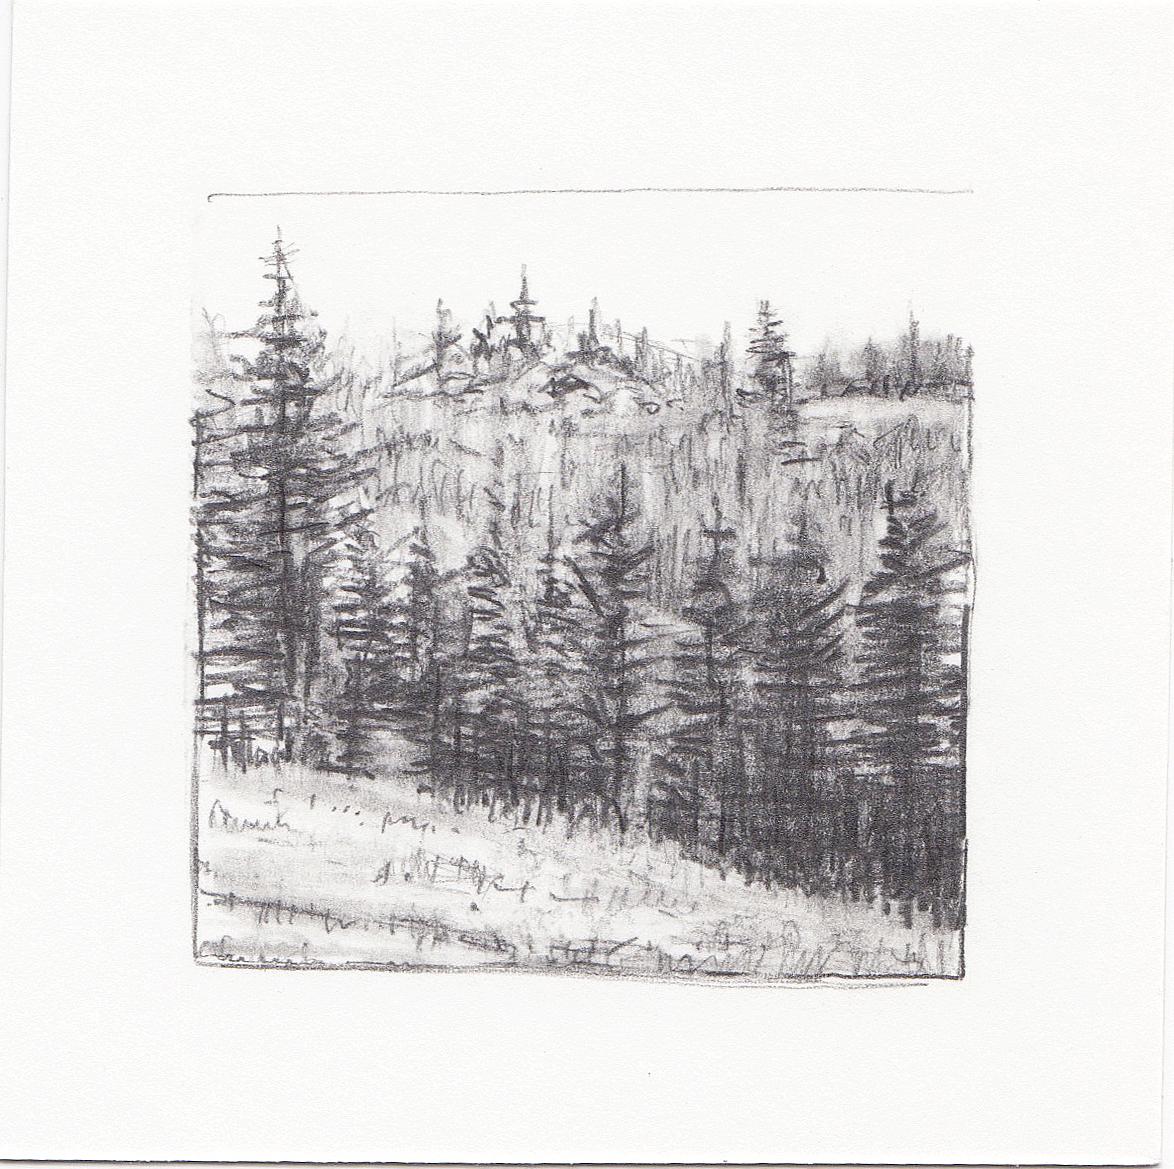 #40 Desolation Lake Trail, Wasatch Mountains, Utah | 3x3 | graphite